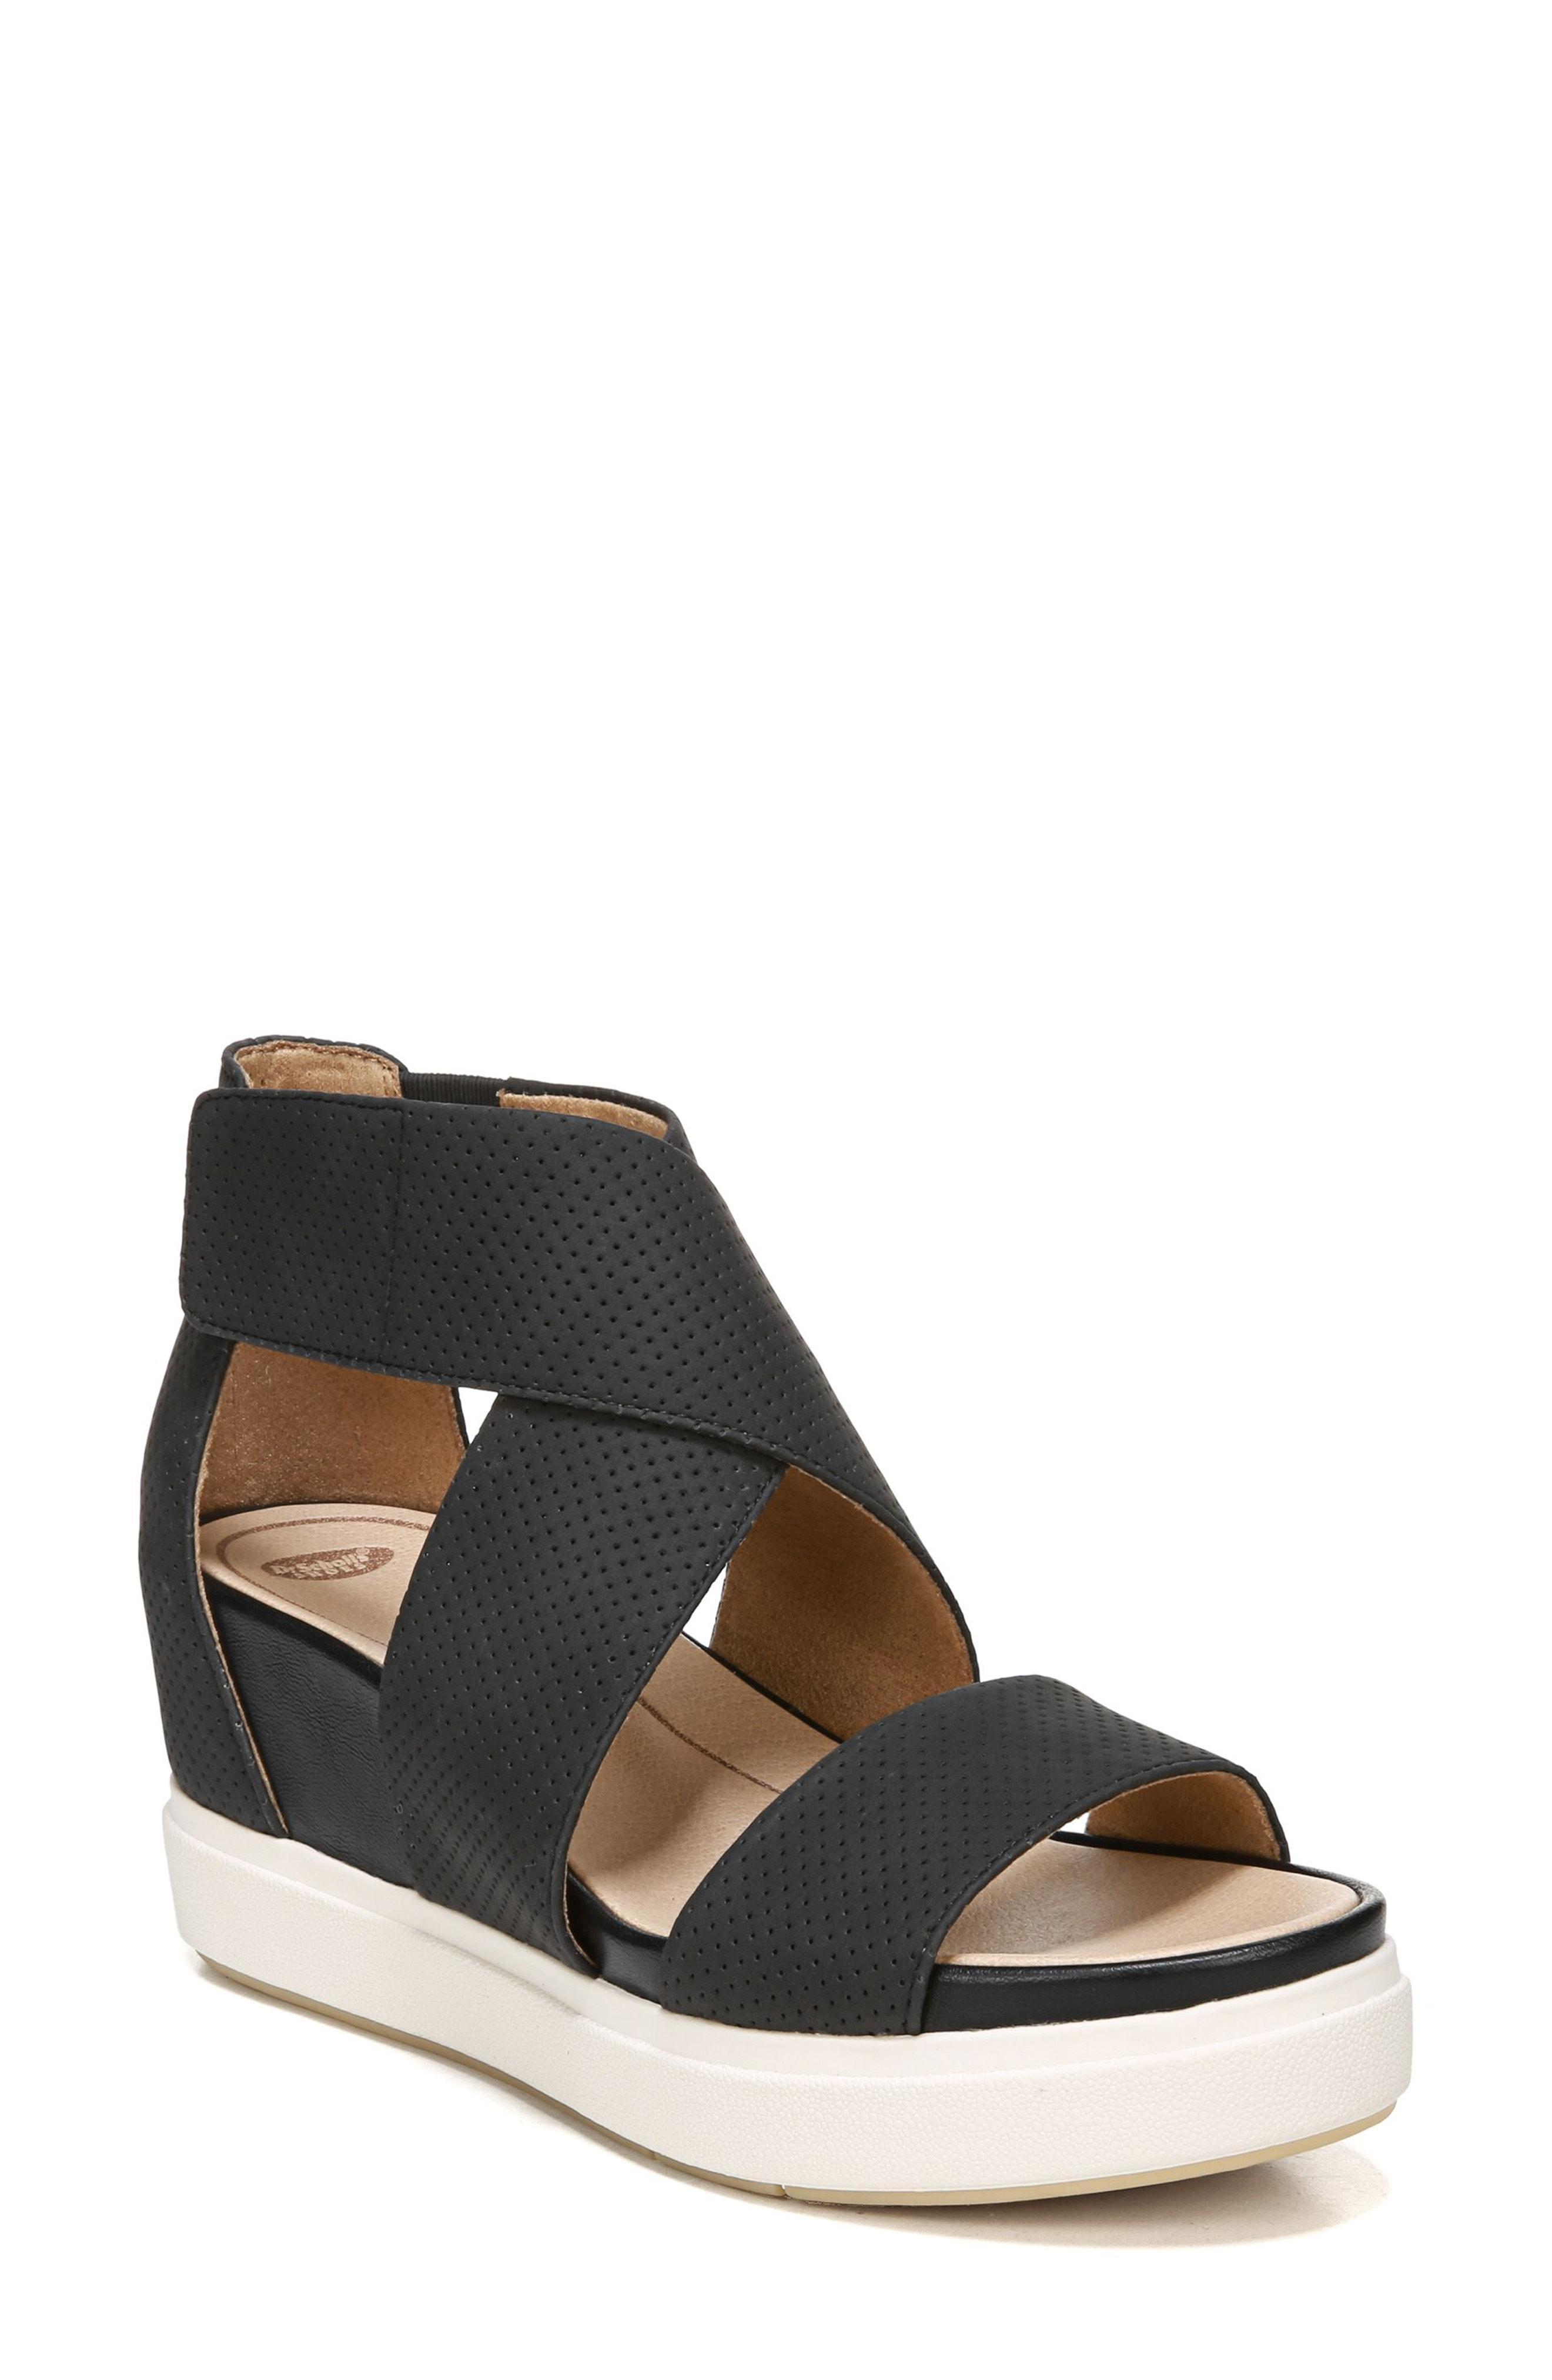 1eaa01cec Lyst - Dr. Scholls Sheena Sport Sandal in Brown